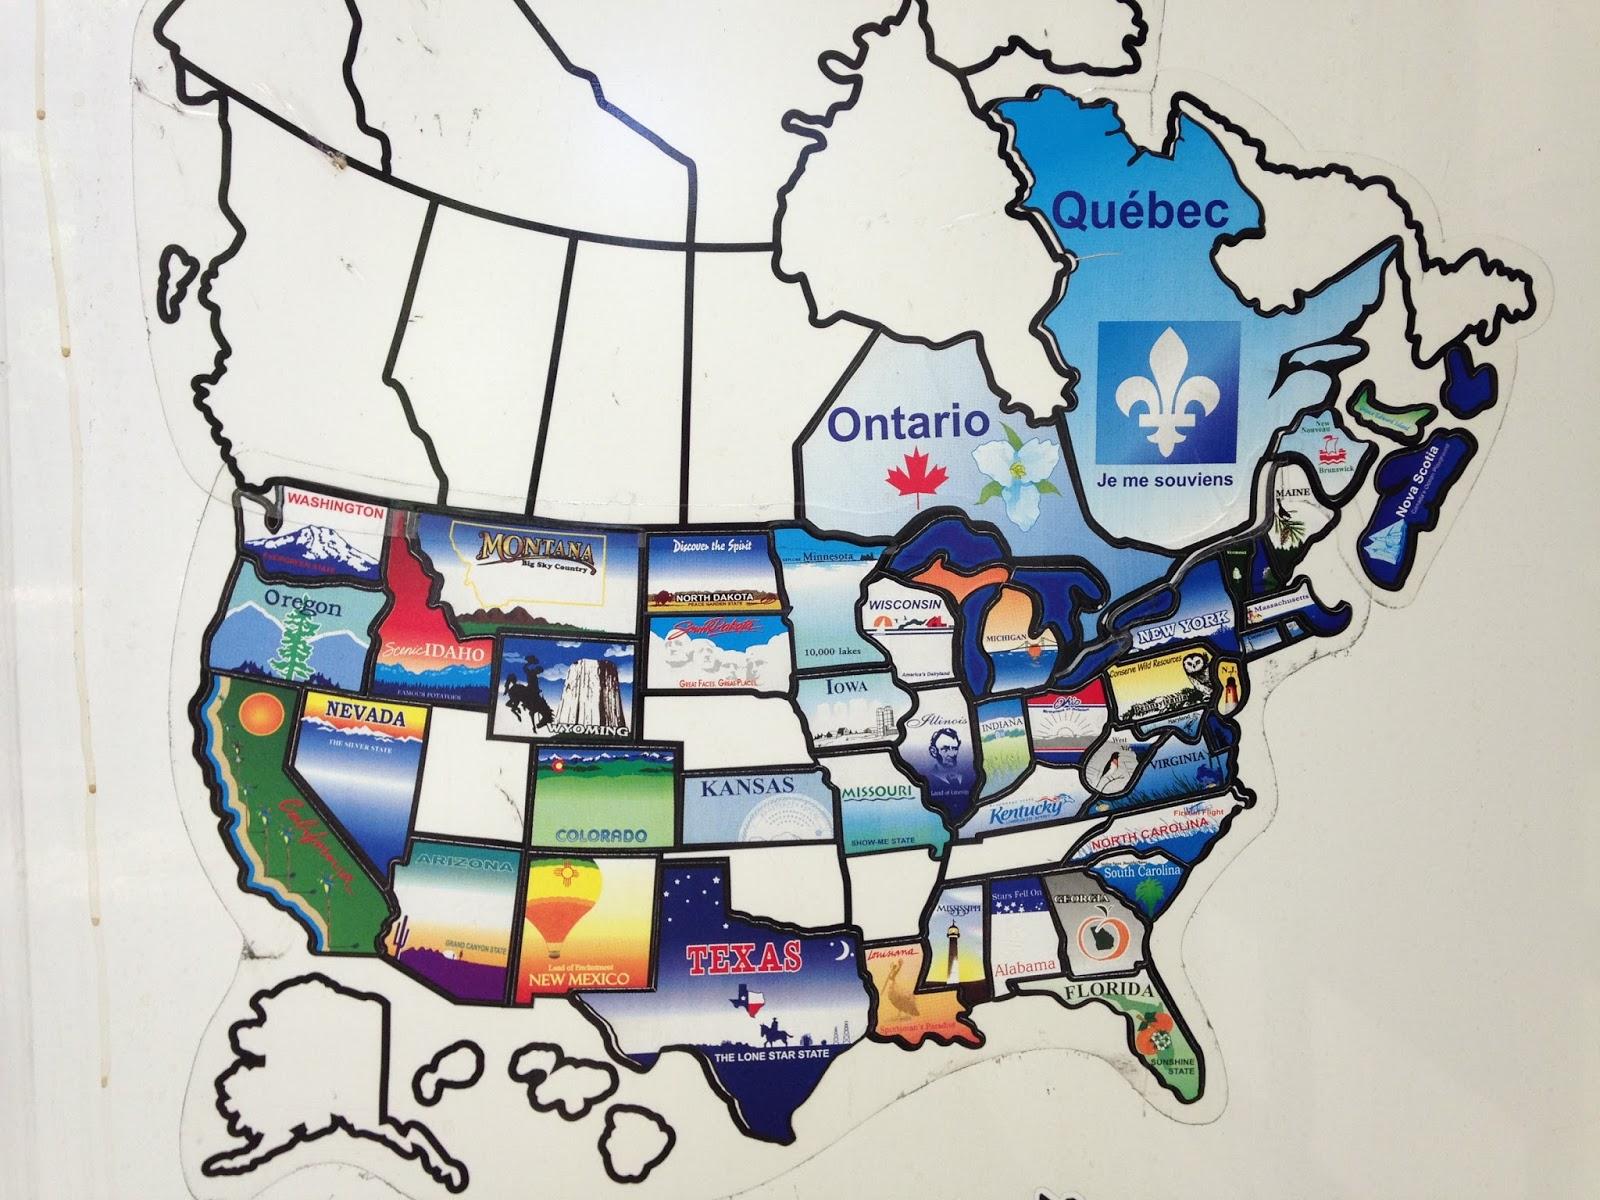 Freedom Oklahoma Map.Freedom Folly 4 19 17 Final Map Of Travels